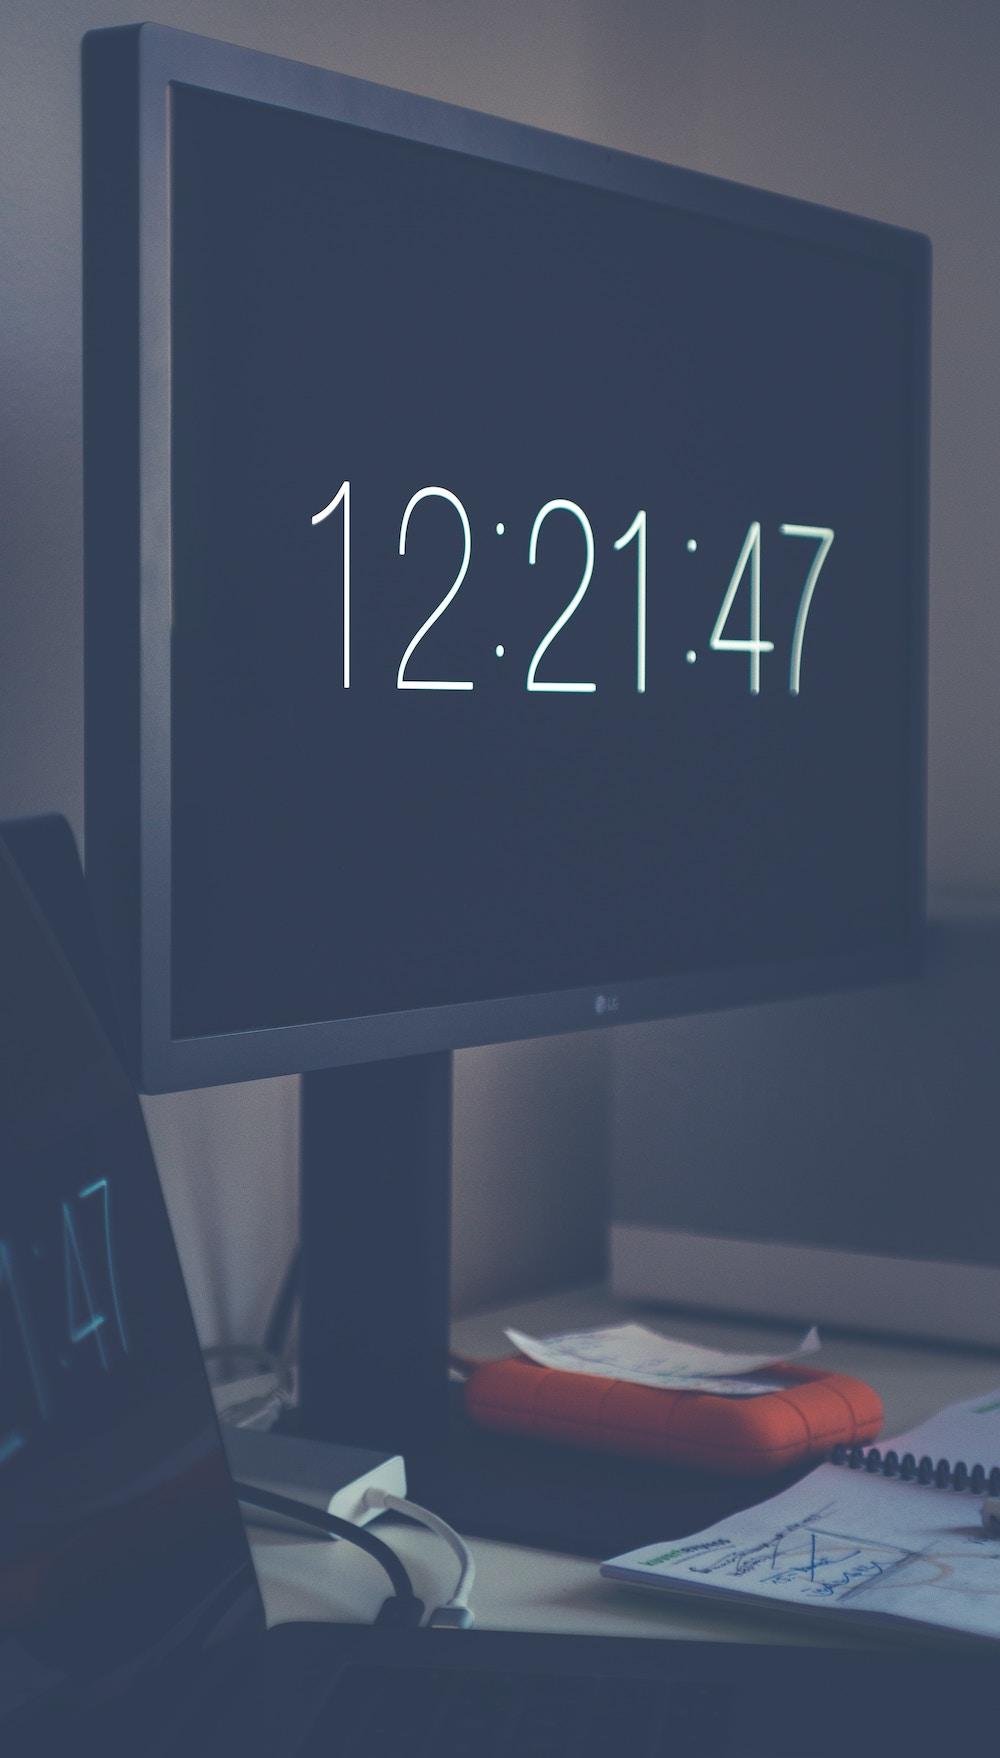 timestamp on screen